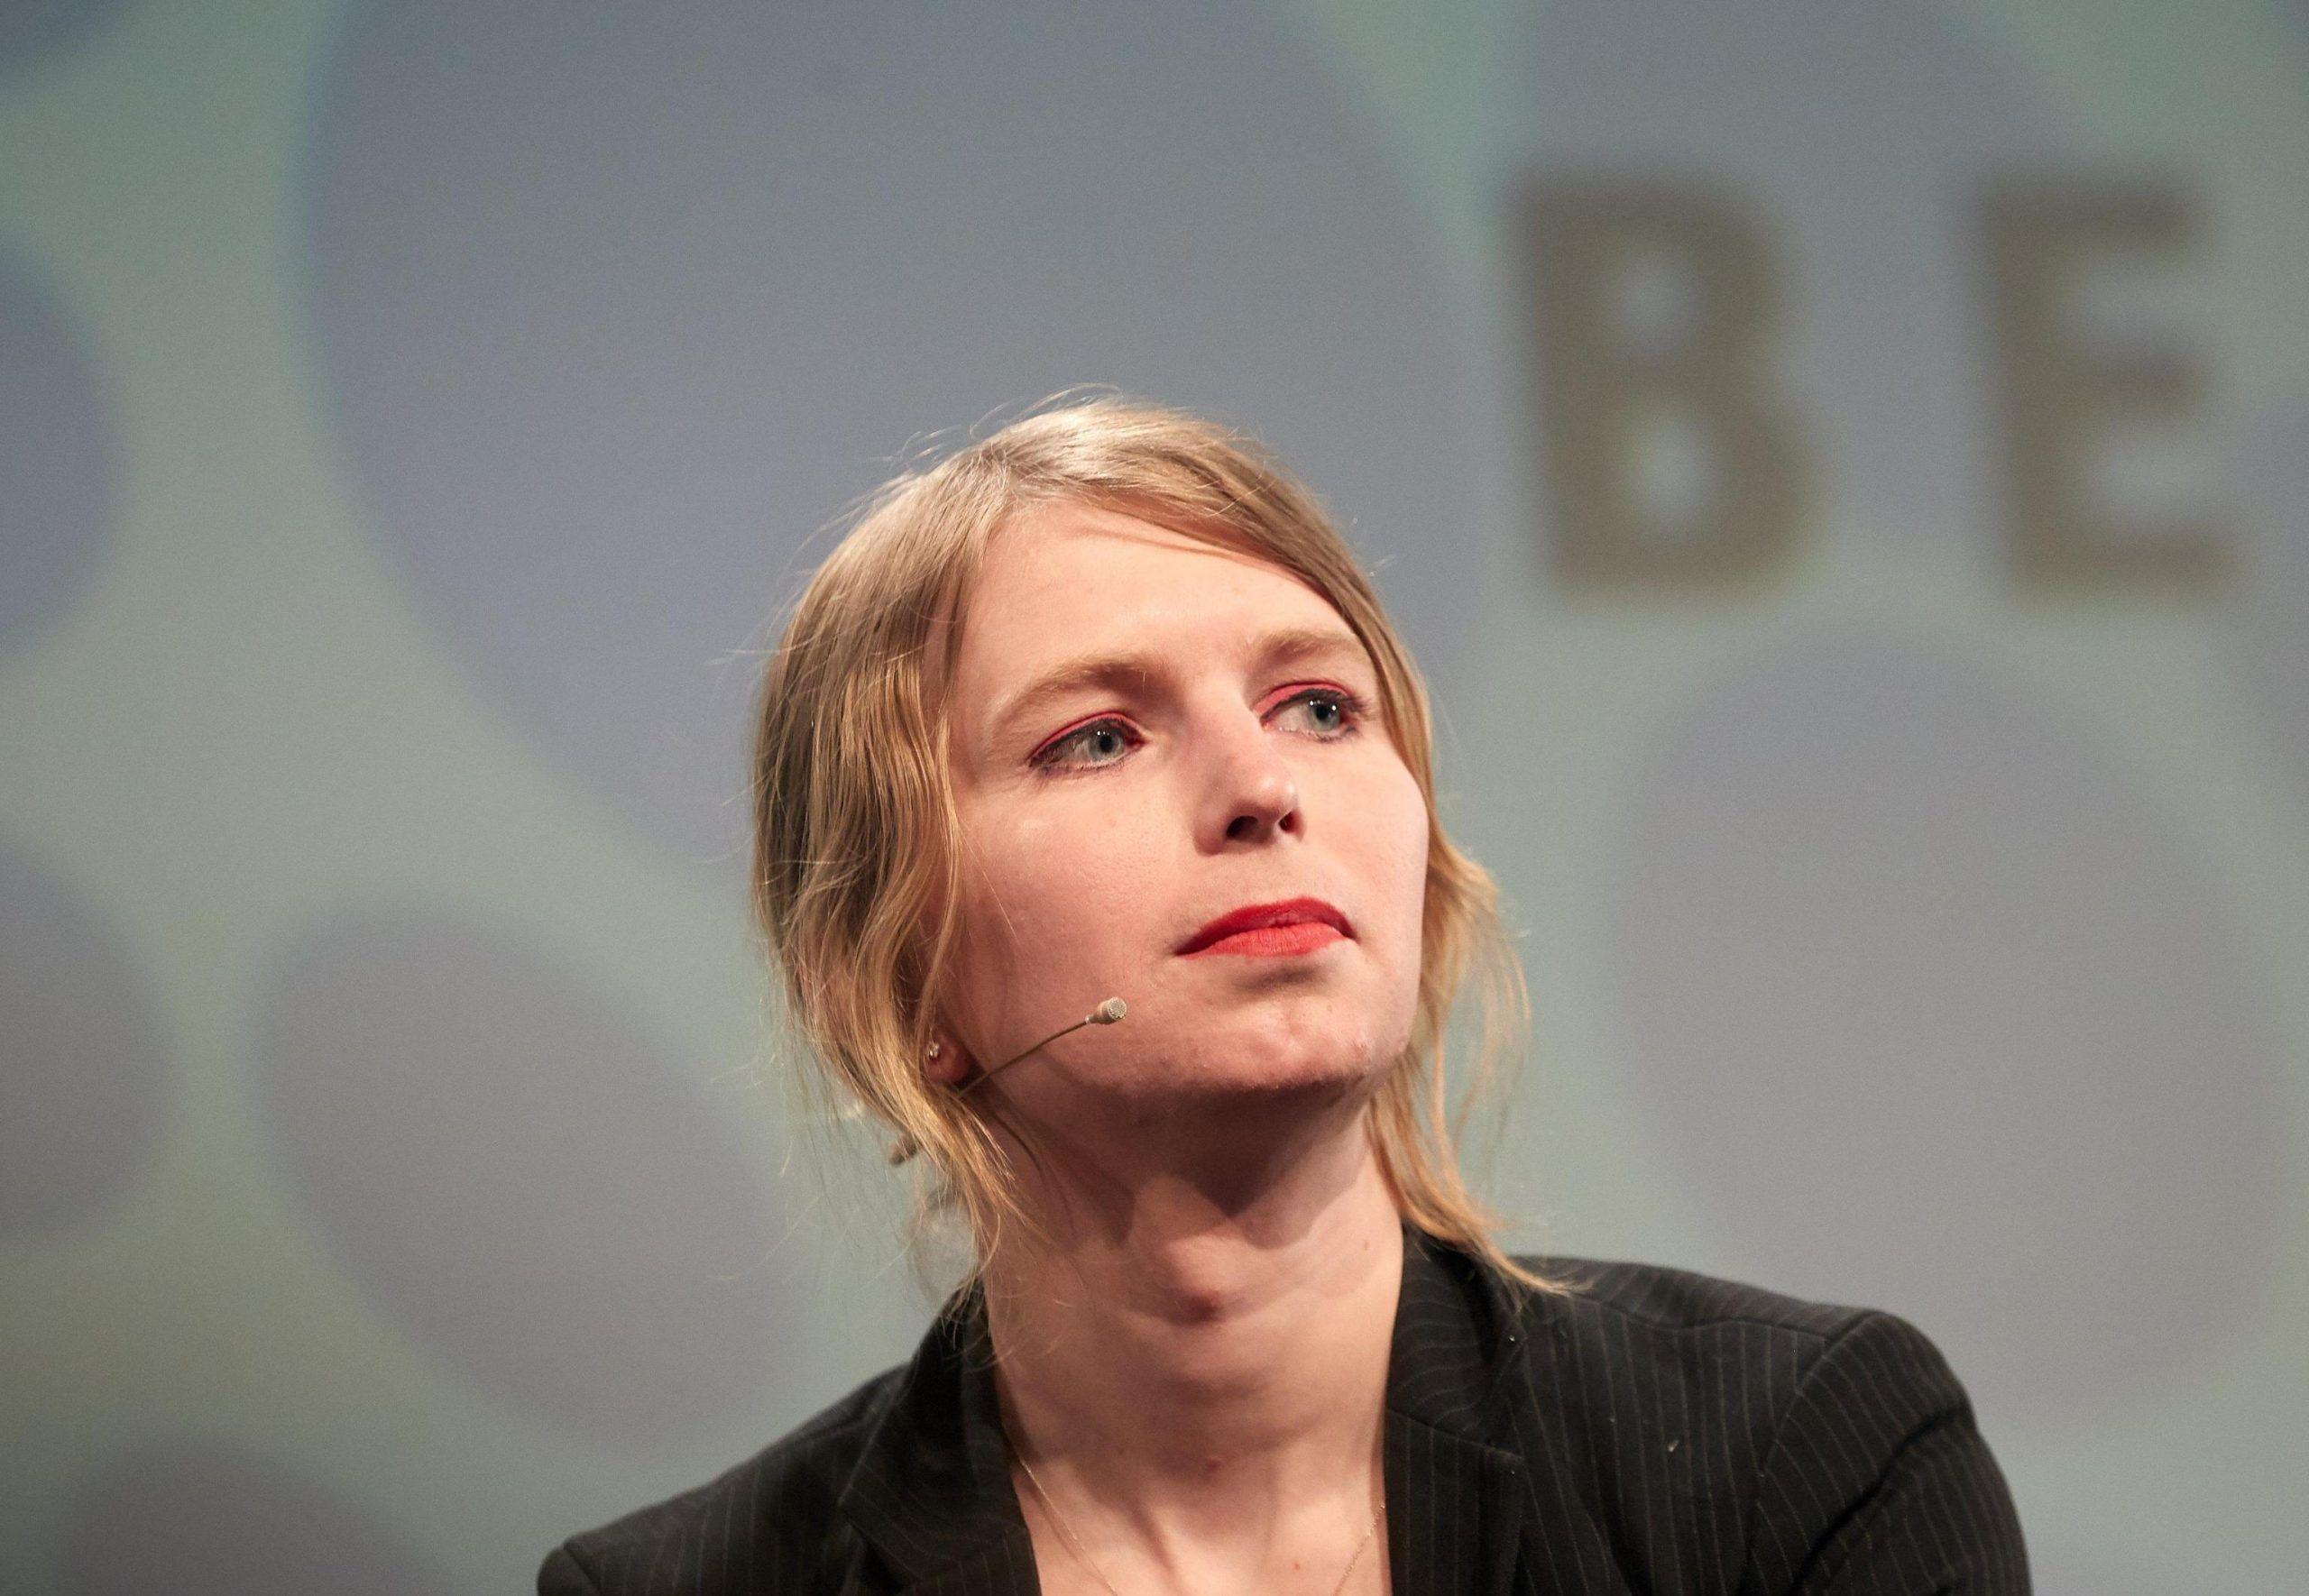 Milano, Chelsea Manning tenta il suicidio